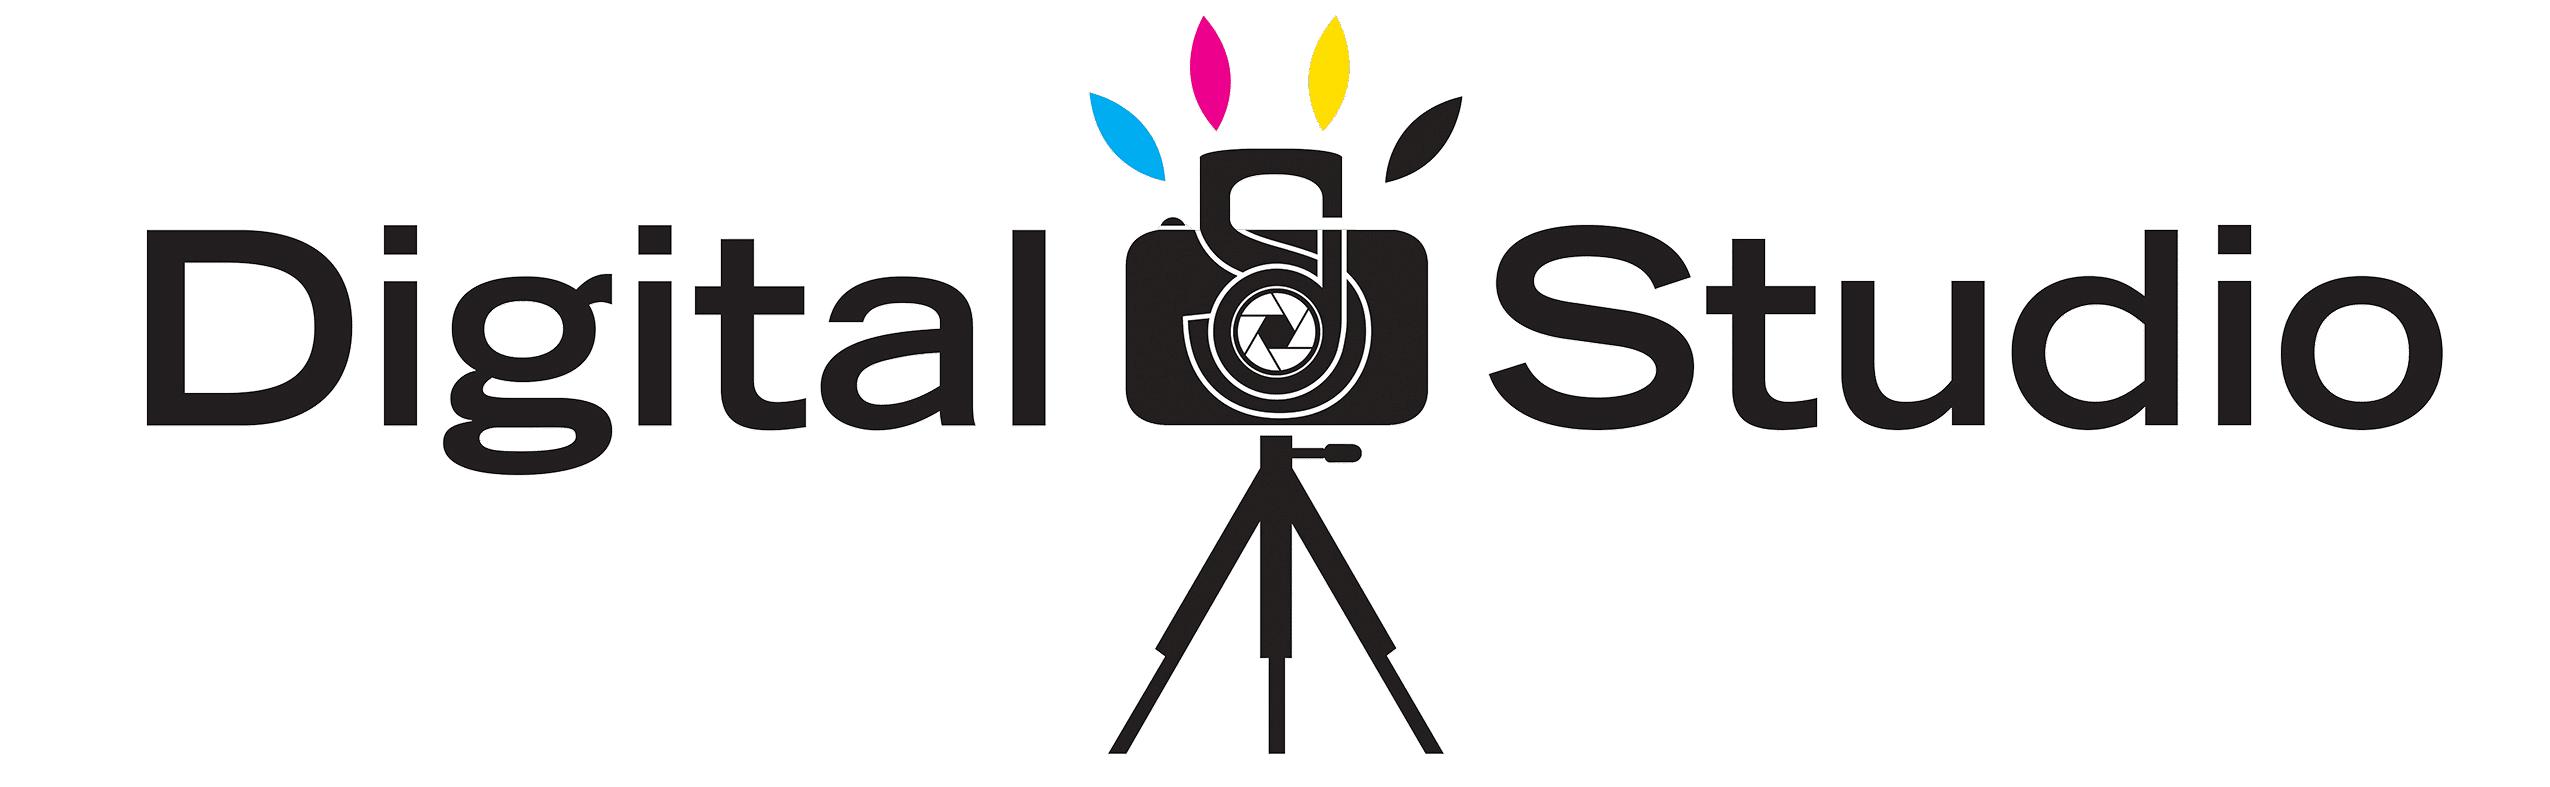 Digital Studio.